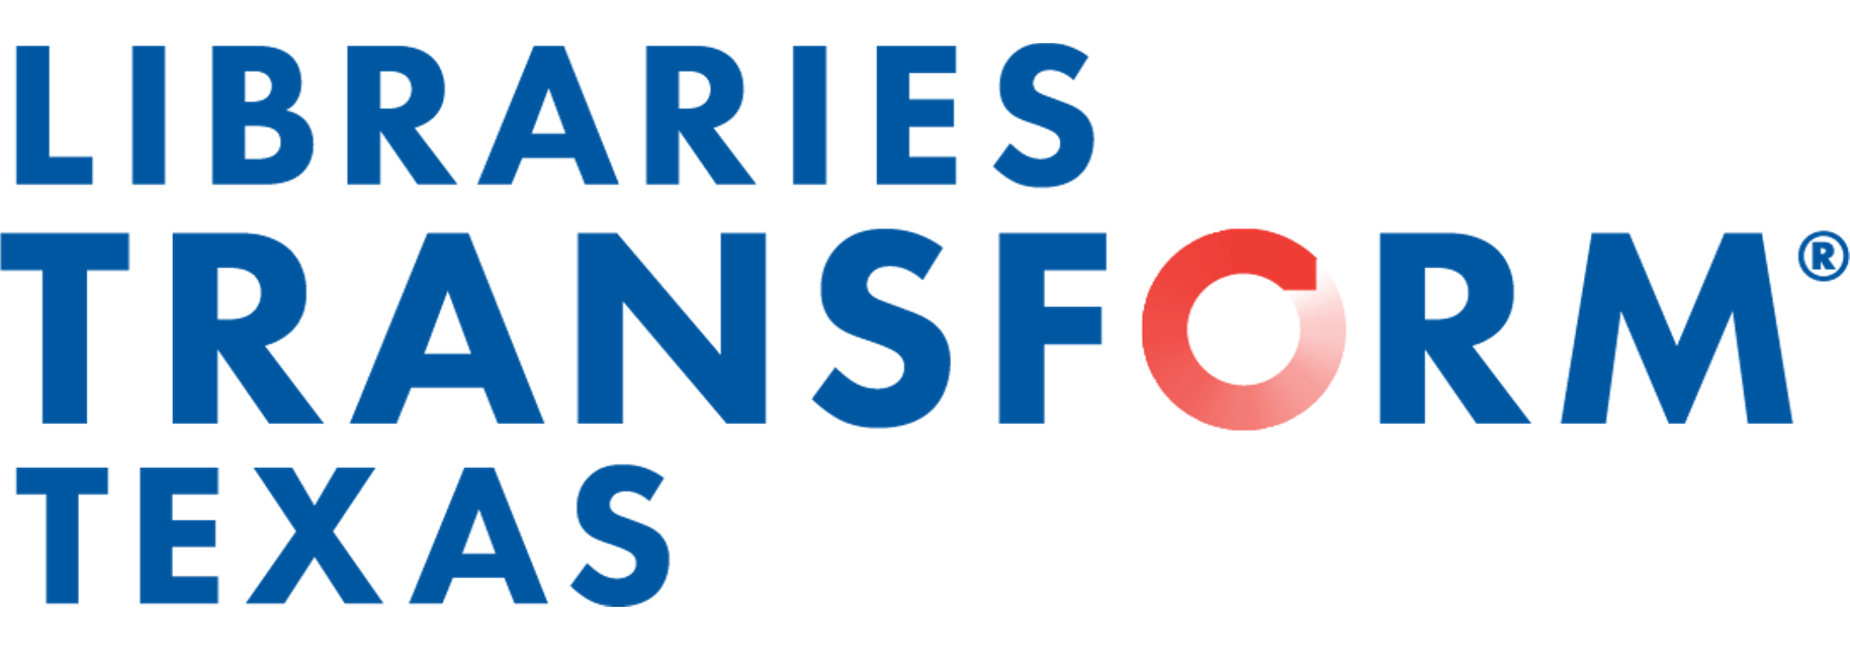 Libraries Transform Texas